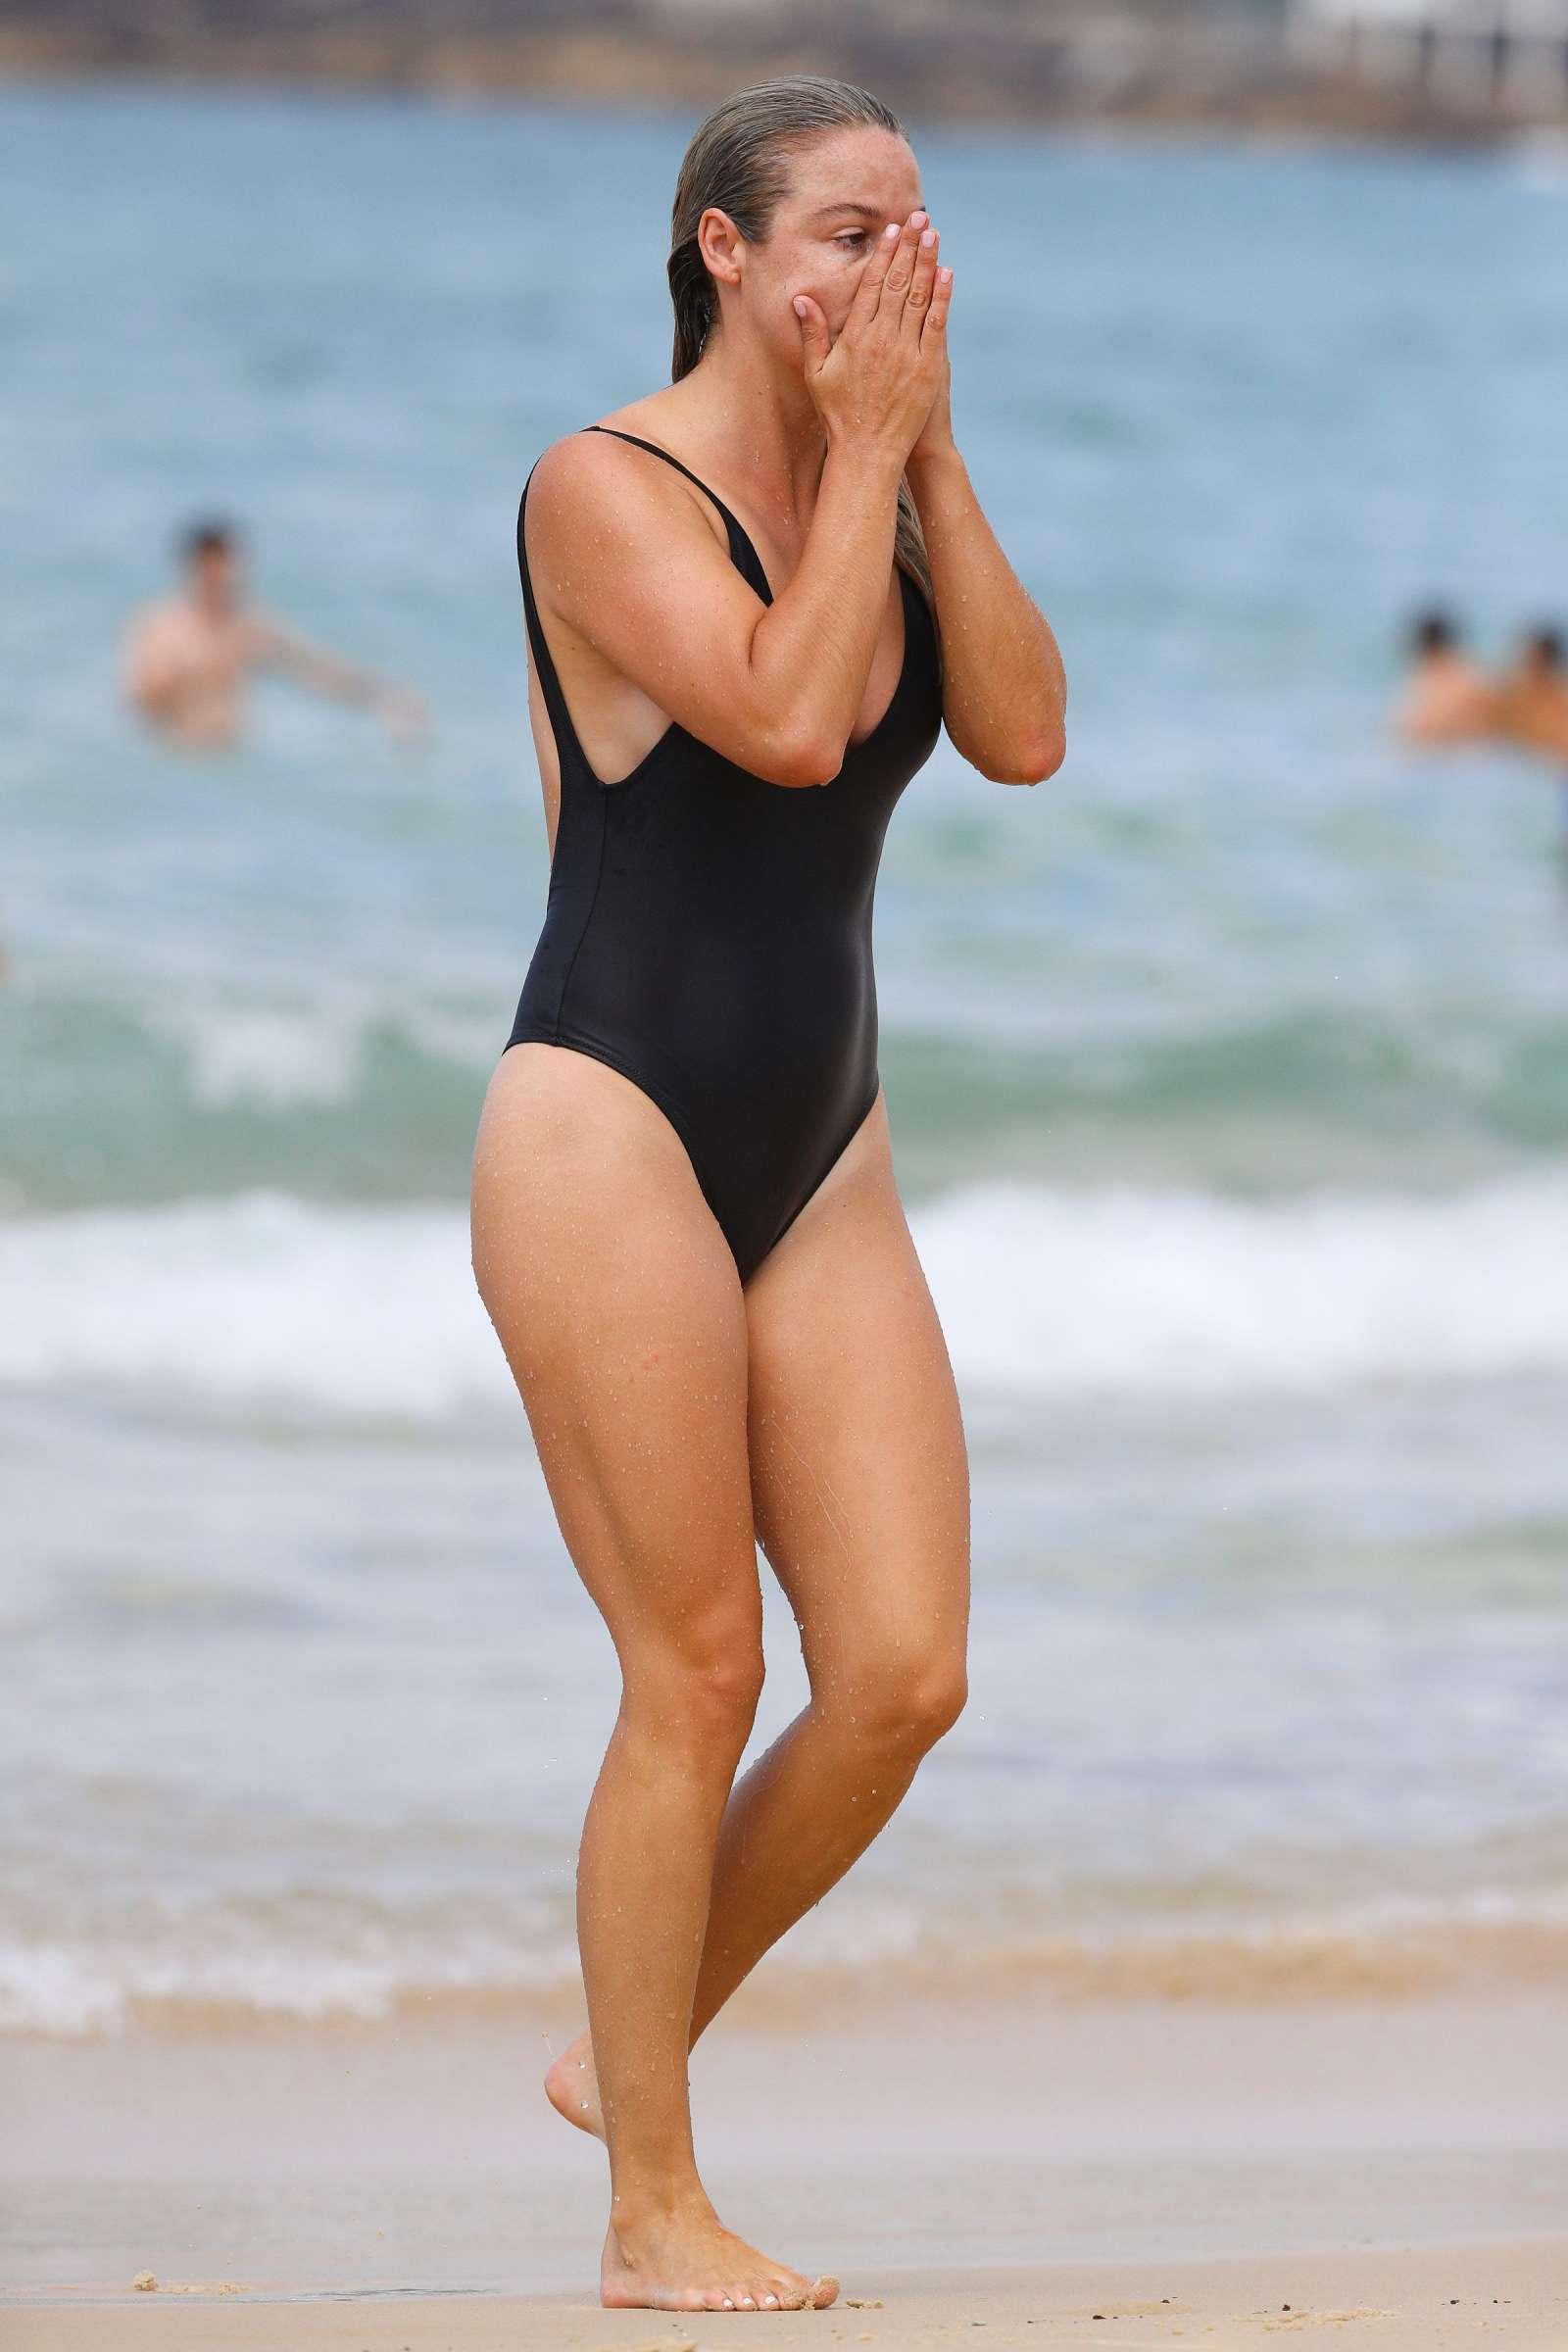 Pics Elise Stacy nude (13 foto and video), Topless, Bikini, Boobs, legs 2006